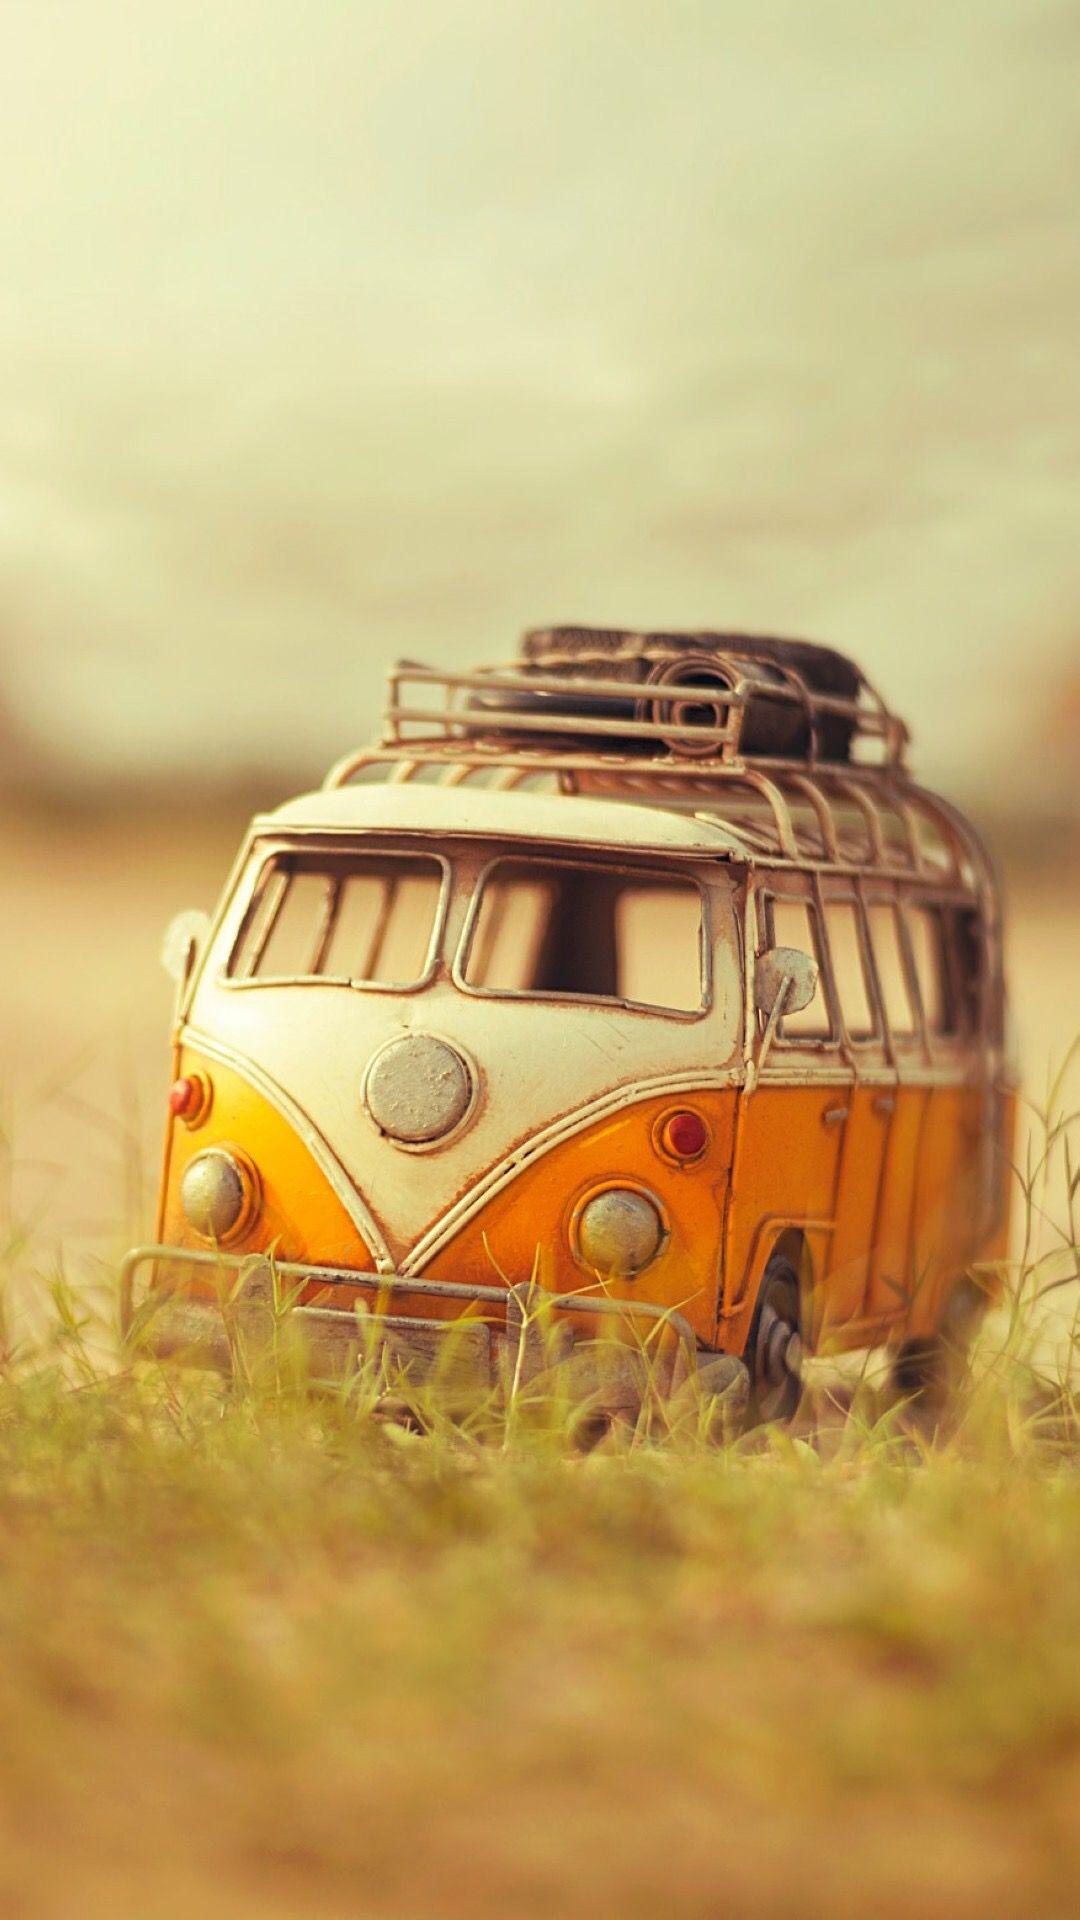 Camper Van Van Toy Car Camper Van